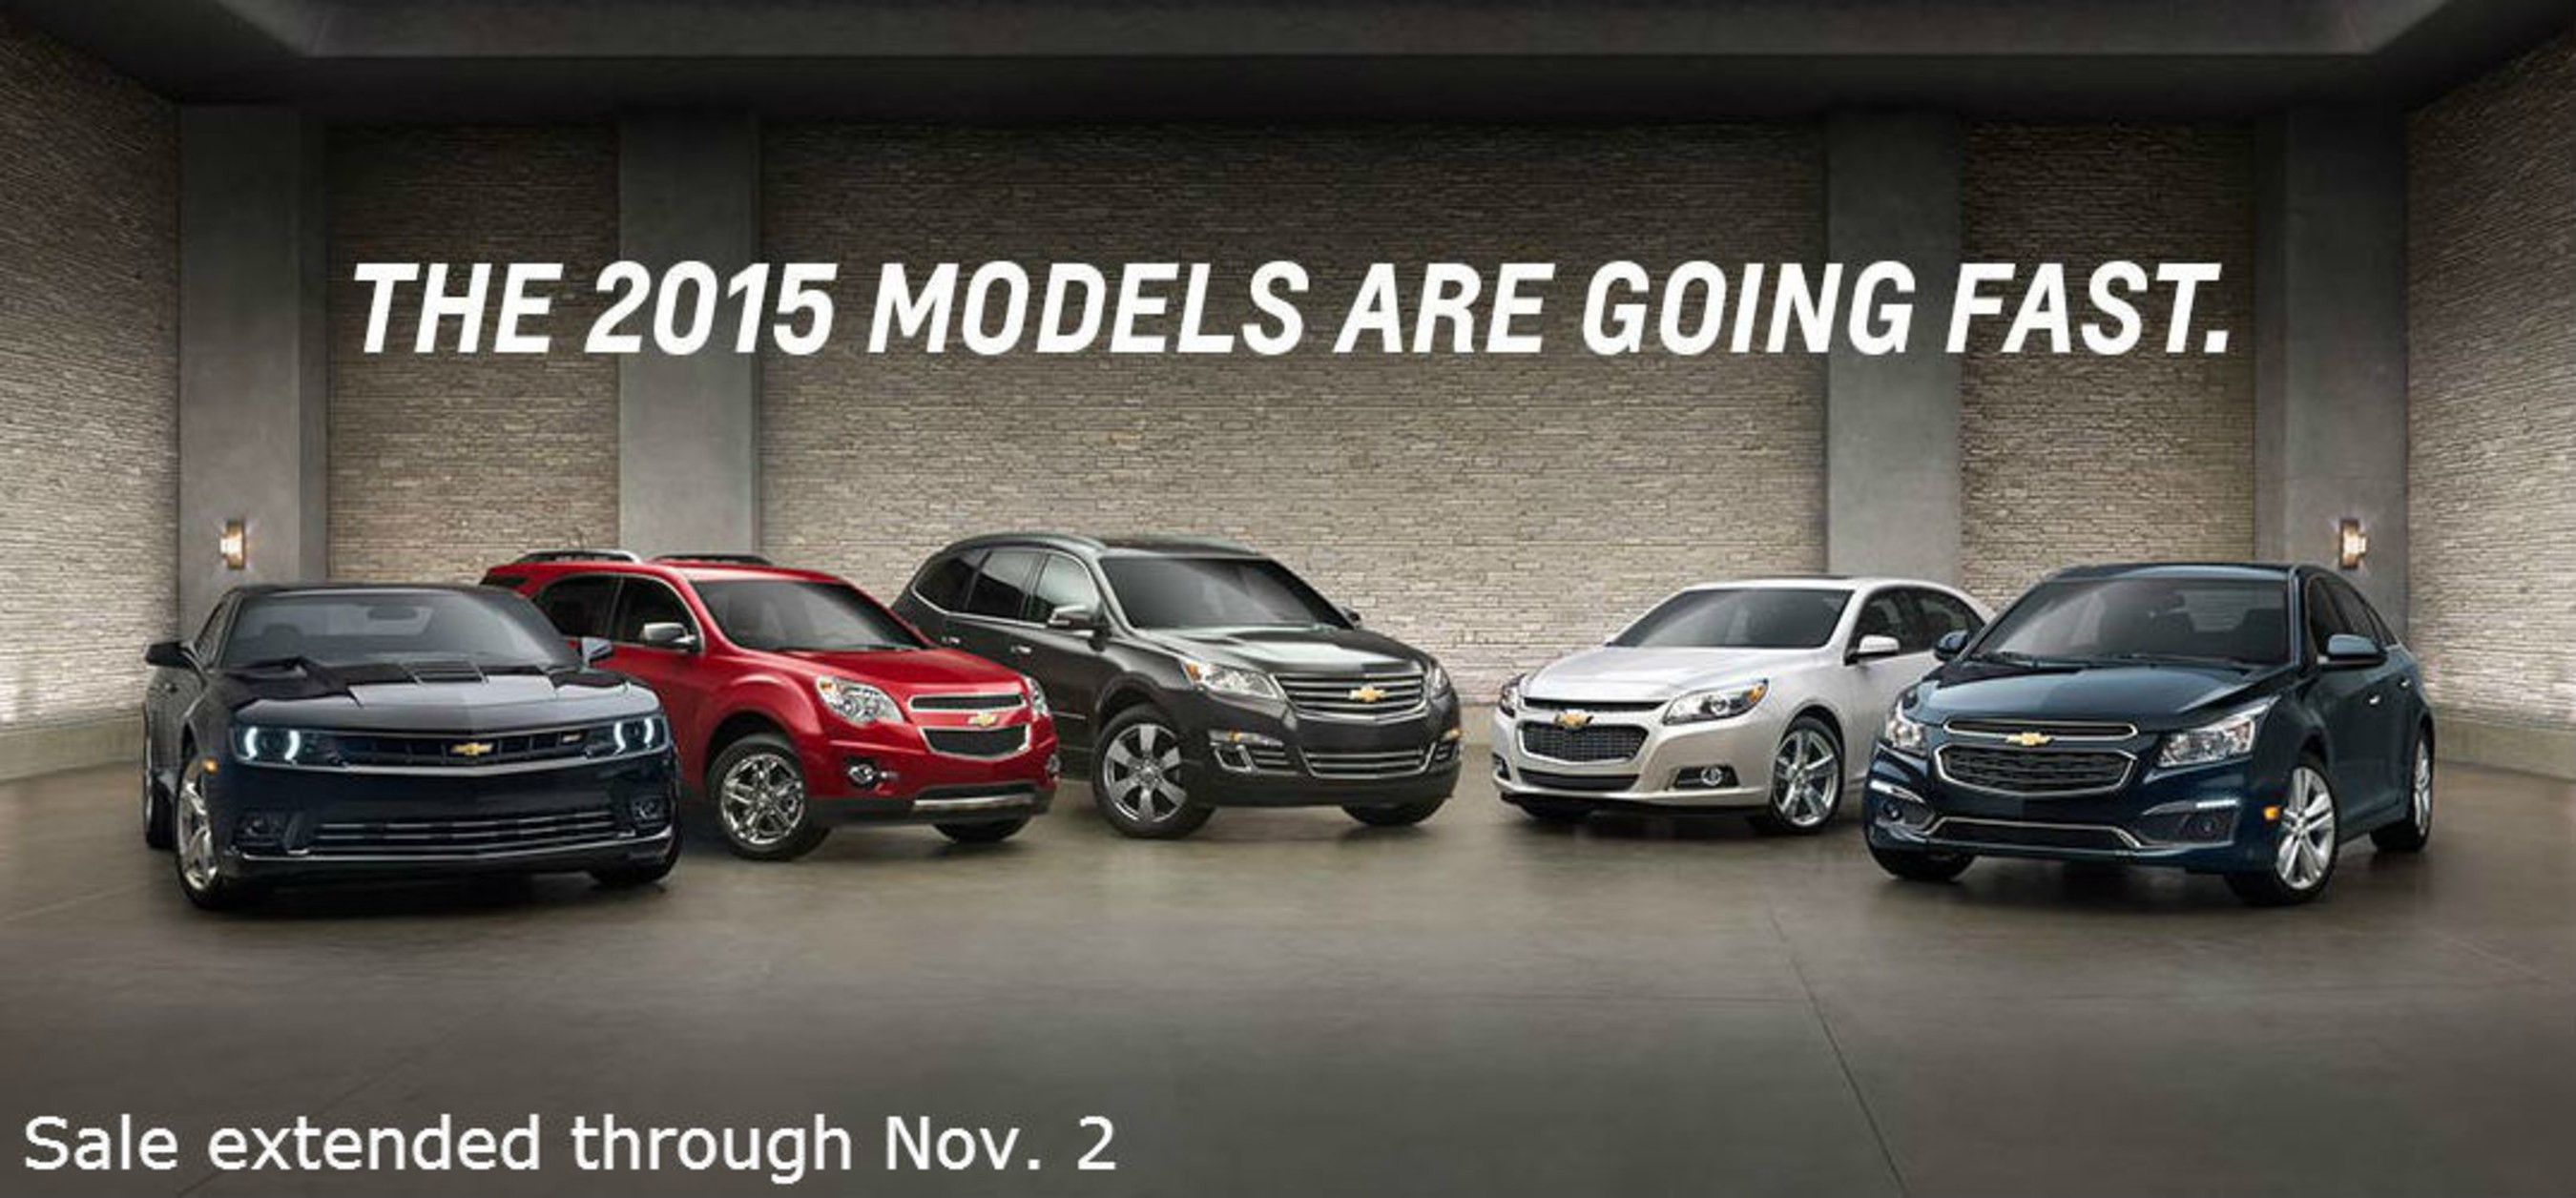 Chevrolet of Naperville extends deadline for sale incentives